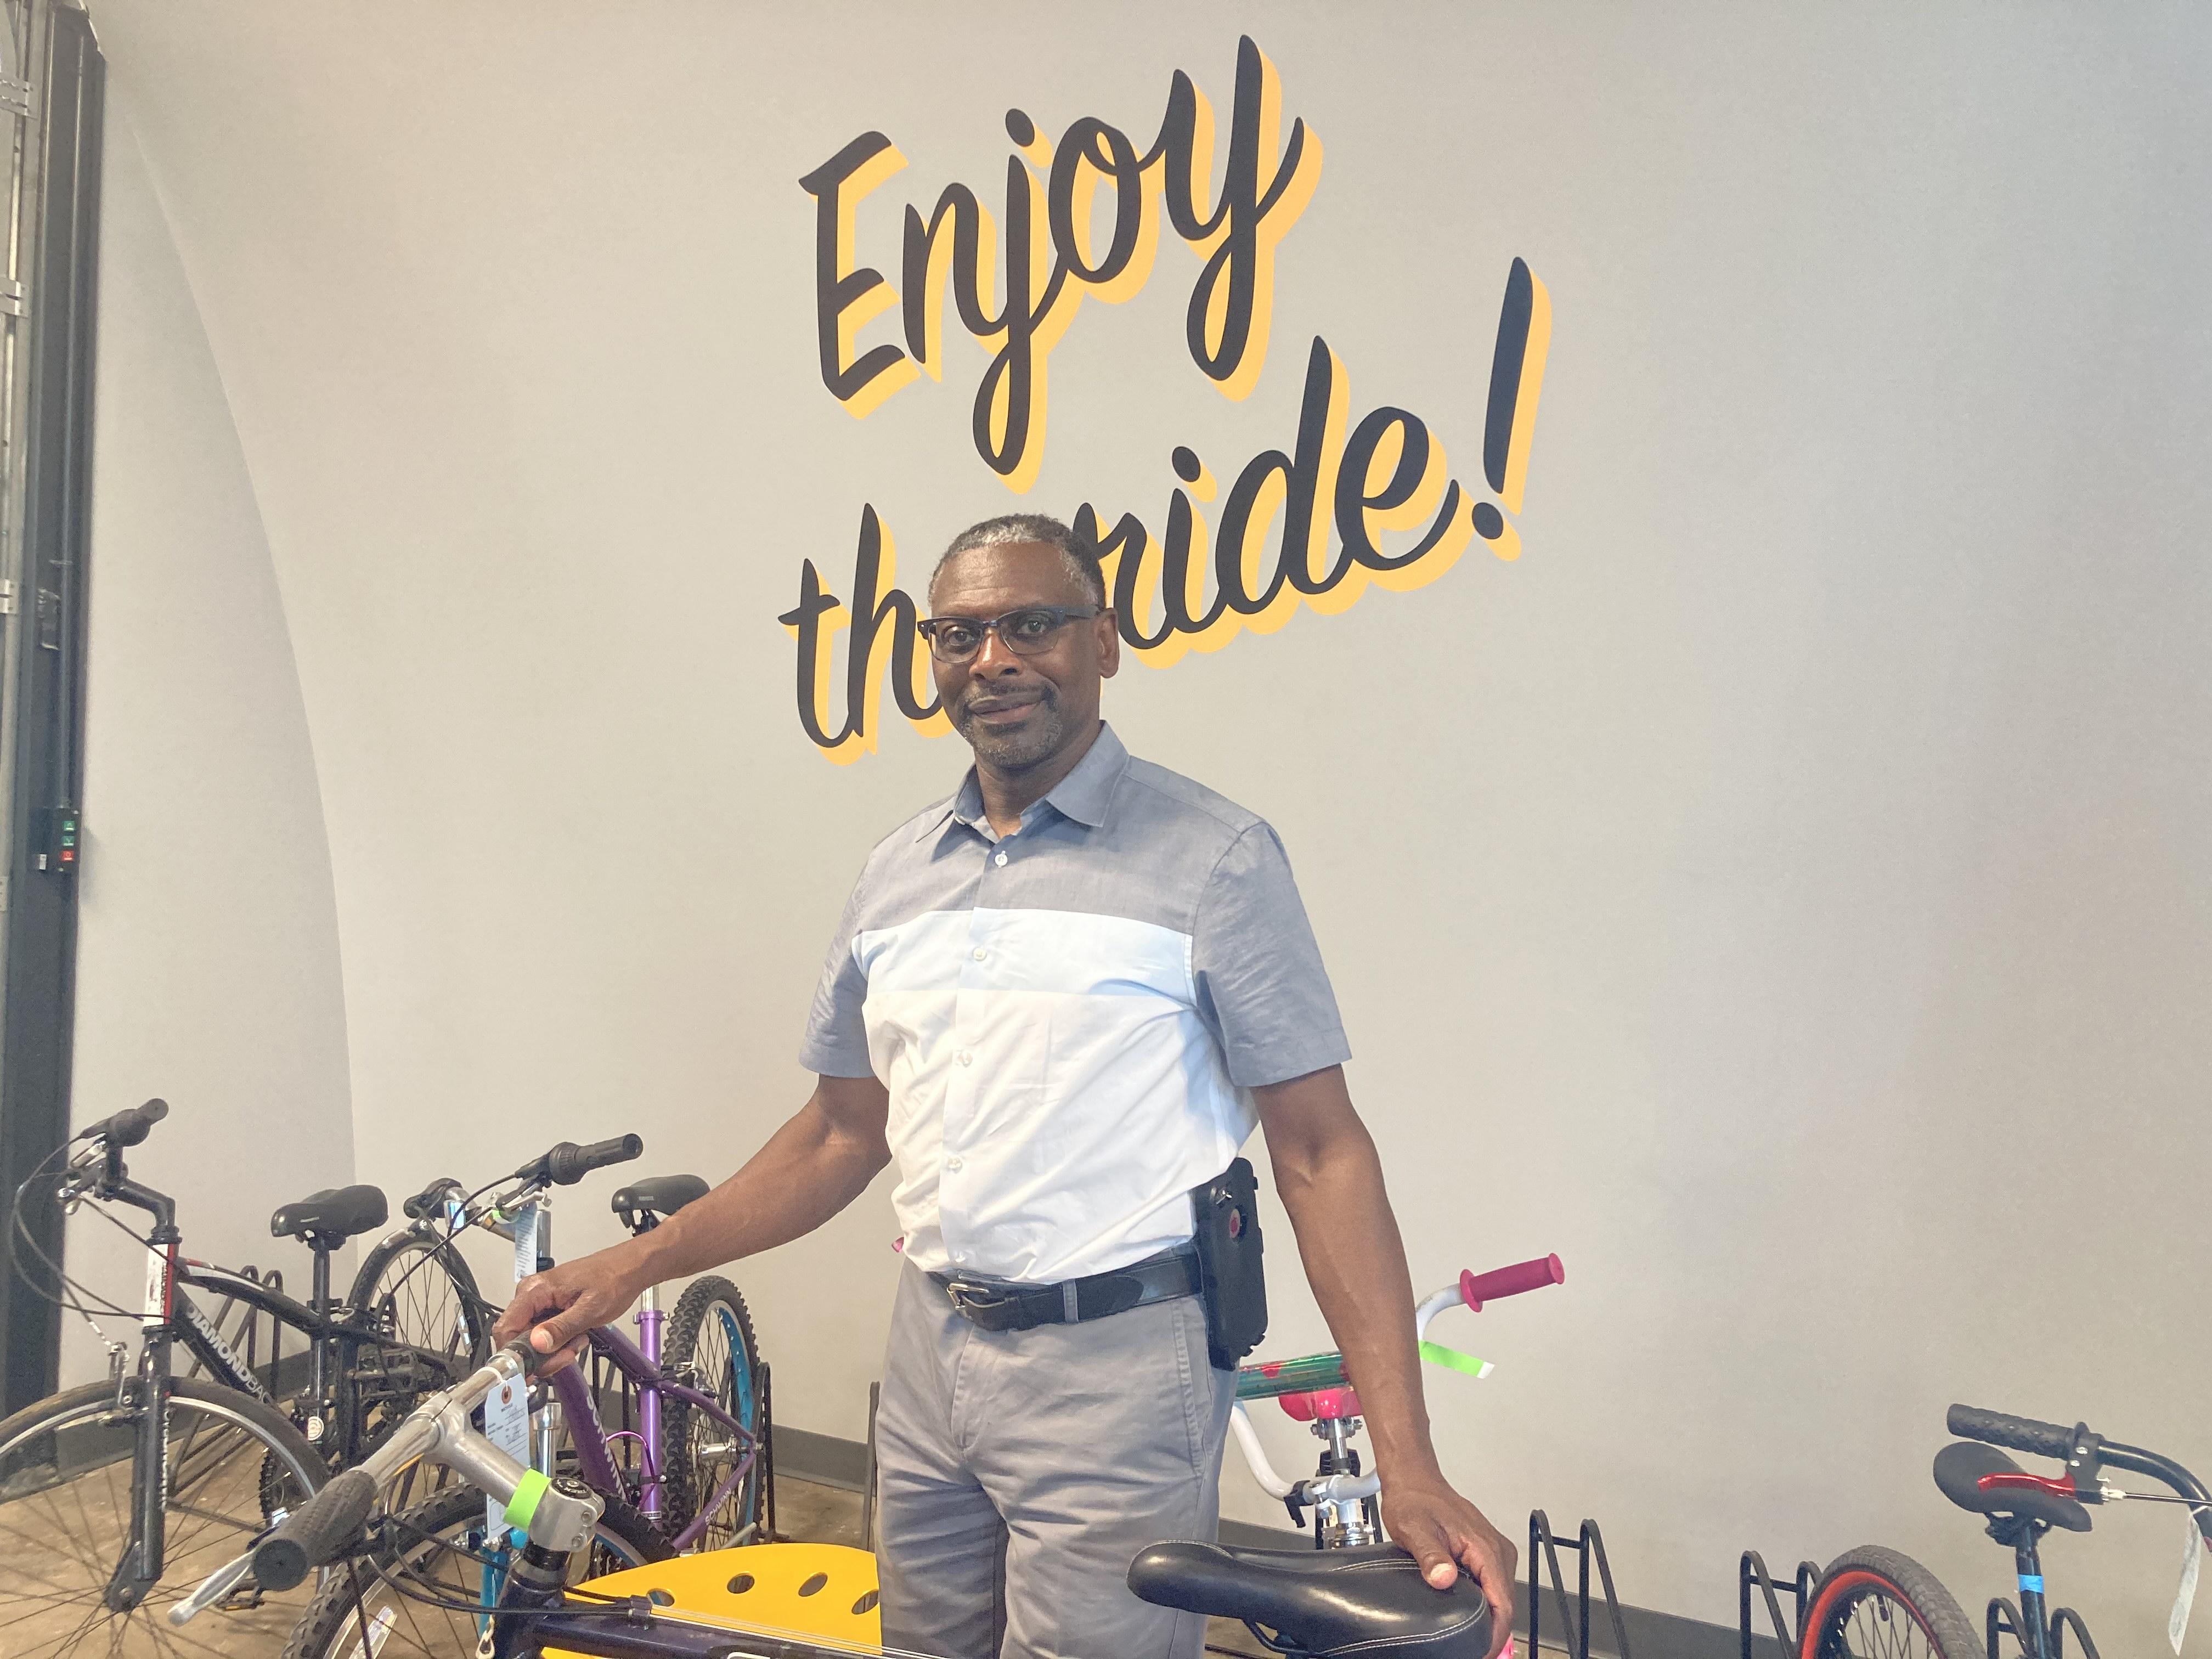 Alton West picks up his grandchildren's bikes from Bearings Bike Works